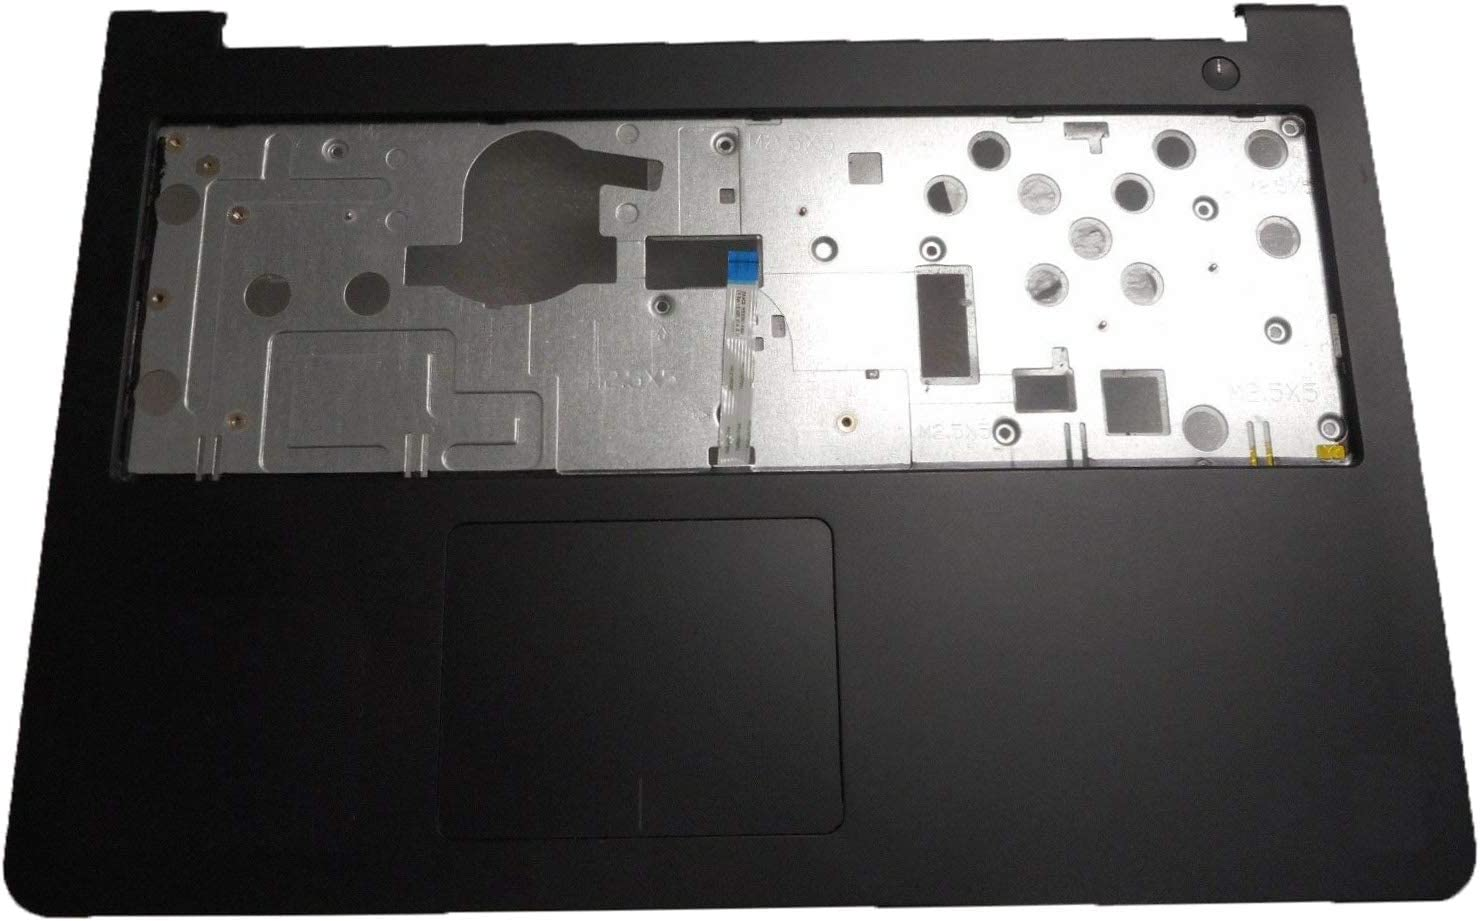 GAOCHENG Laptop Palmrest for DELL Inspiron 5542 5543 5545 5547 5548 5557 P39F Black touchpad AP13G000100 0K1M13 K1M13 Upper case